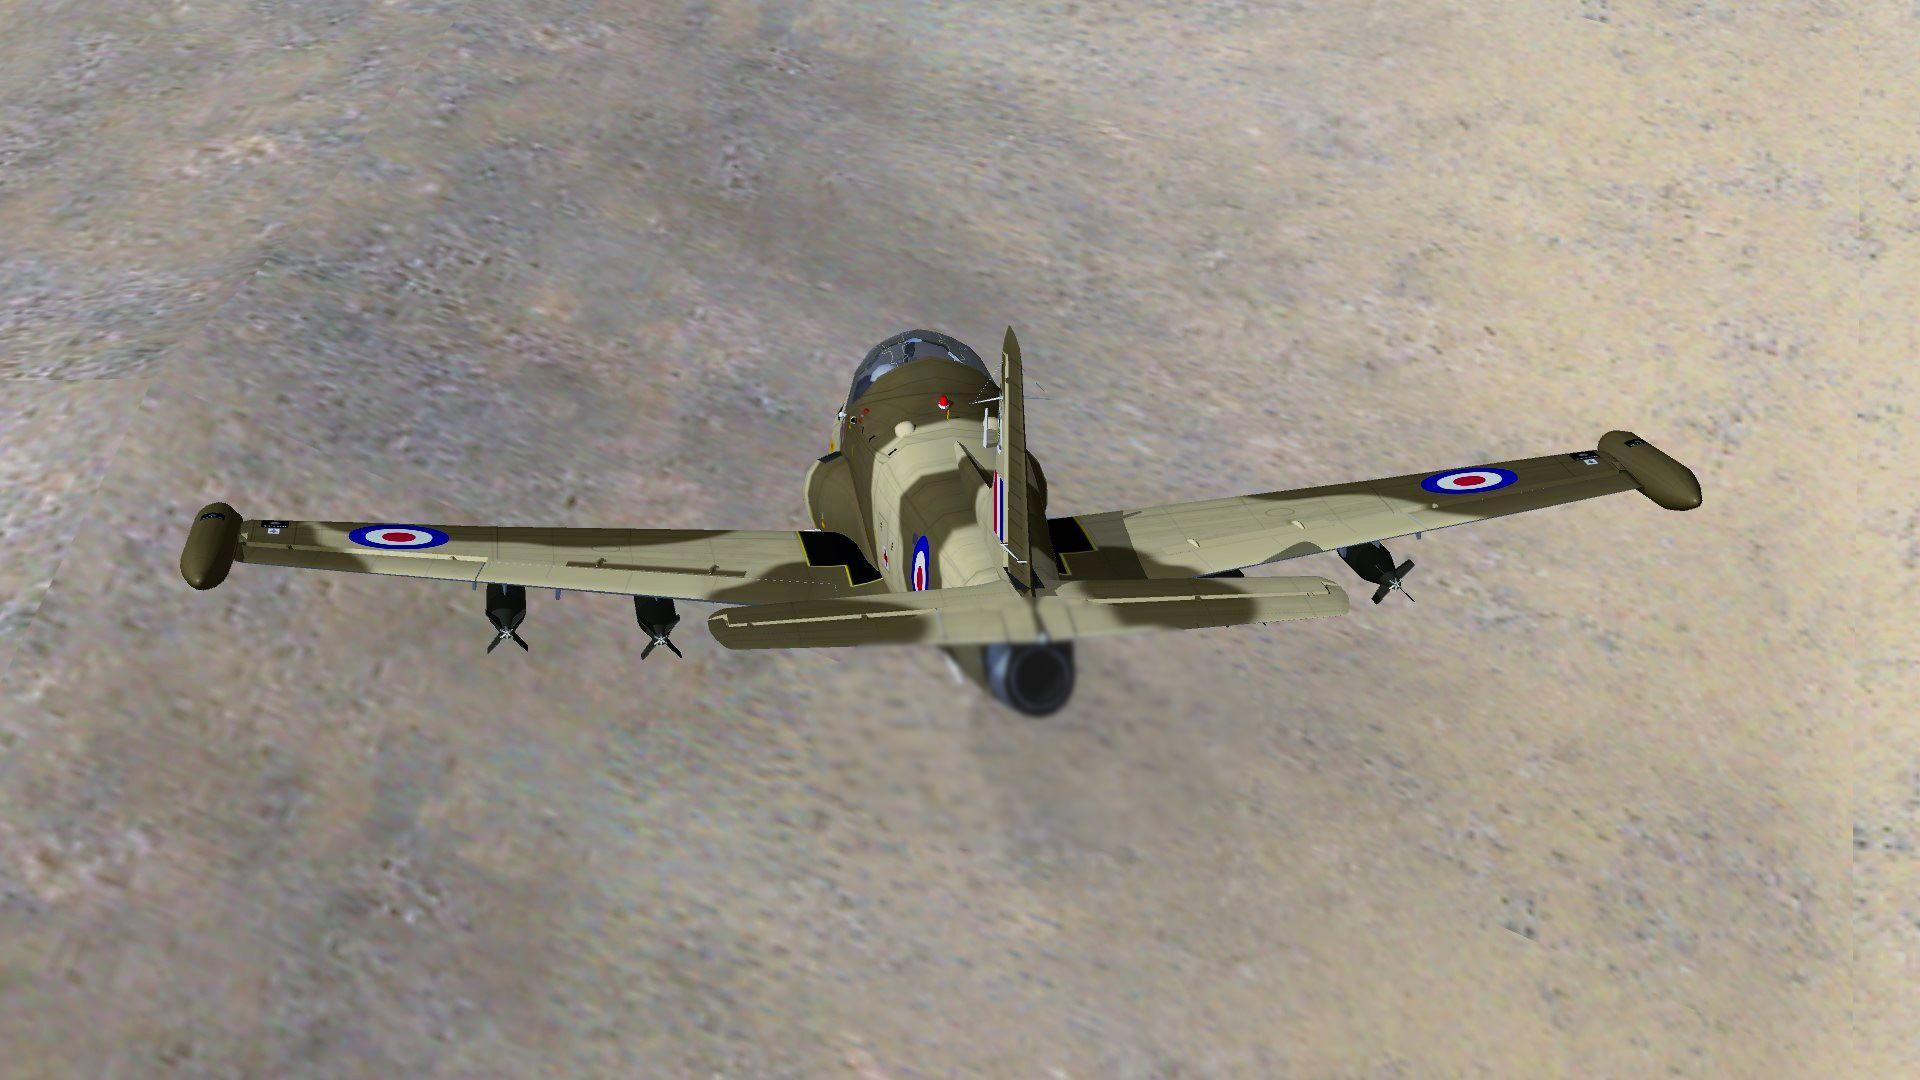 RAF%20STRIKEFIGHTER%20FGA1.04_zpszvfttiw